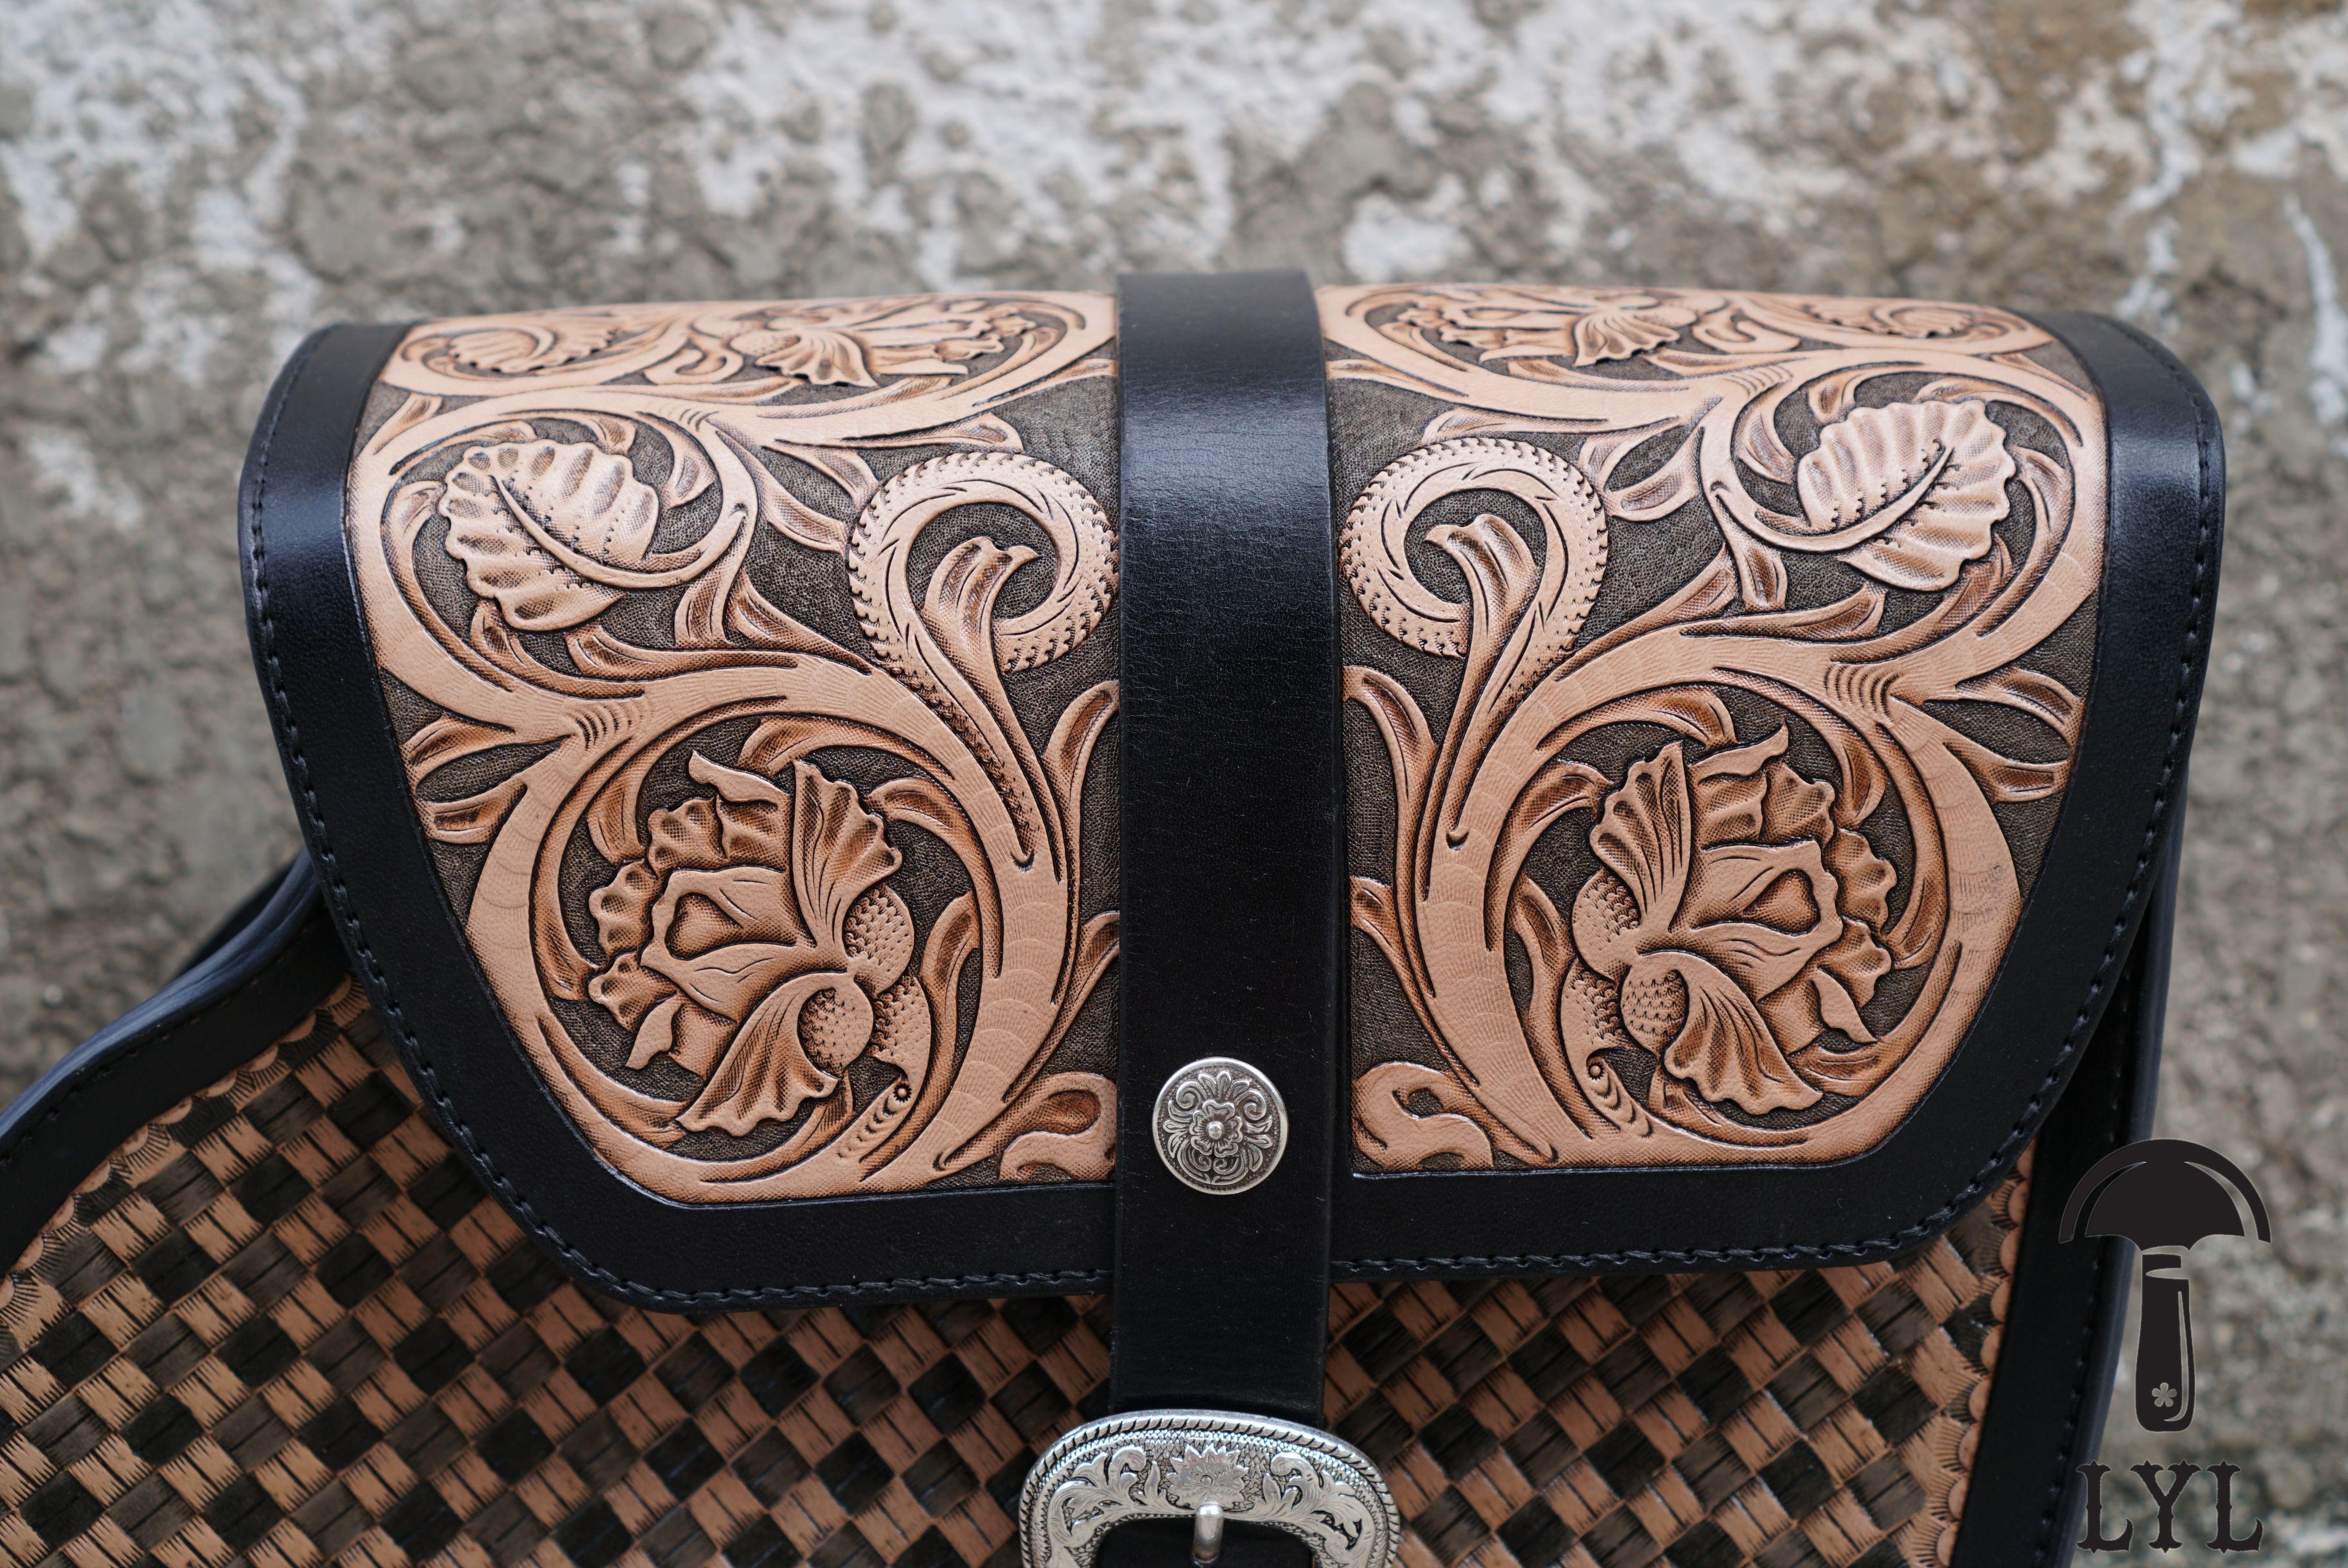 ec175ffcd101 Pin by LYL HANDMADE on SR400 Side Bags